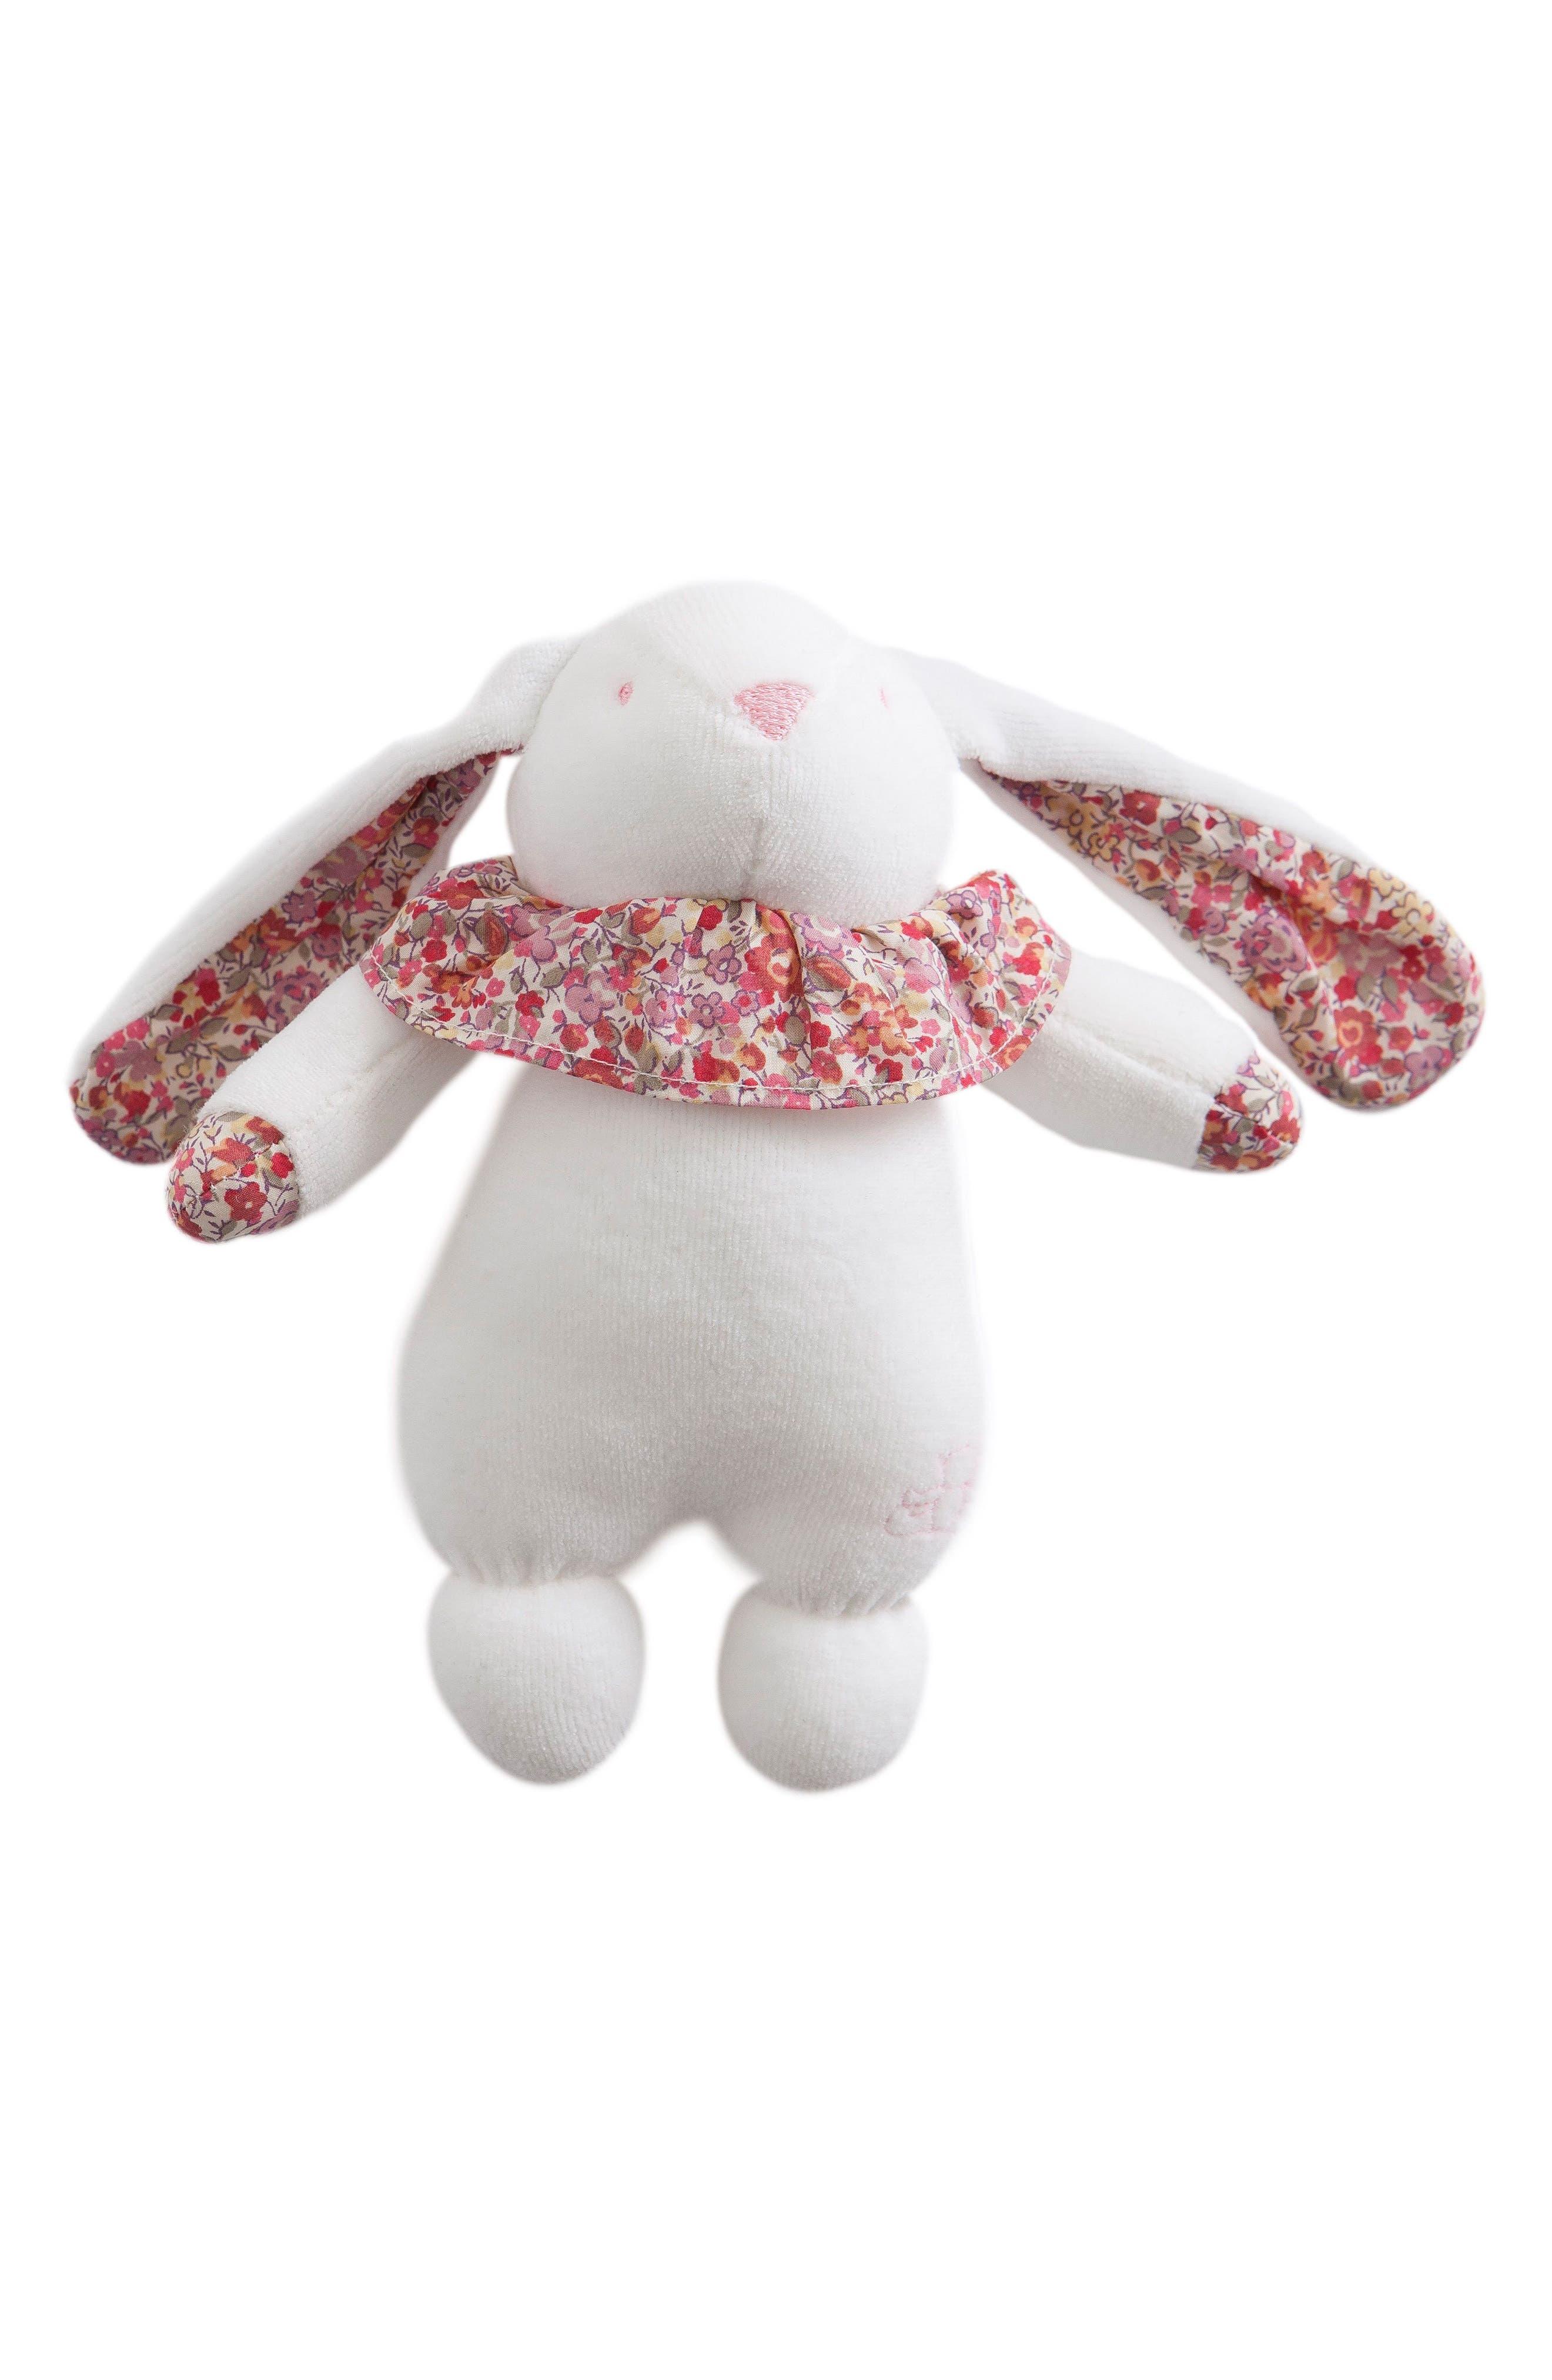 Pamplemousse Peluches x Liberty of London Rabbit Rattle